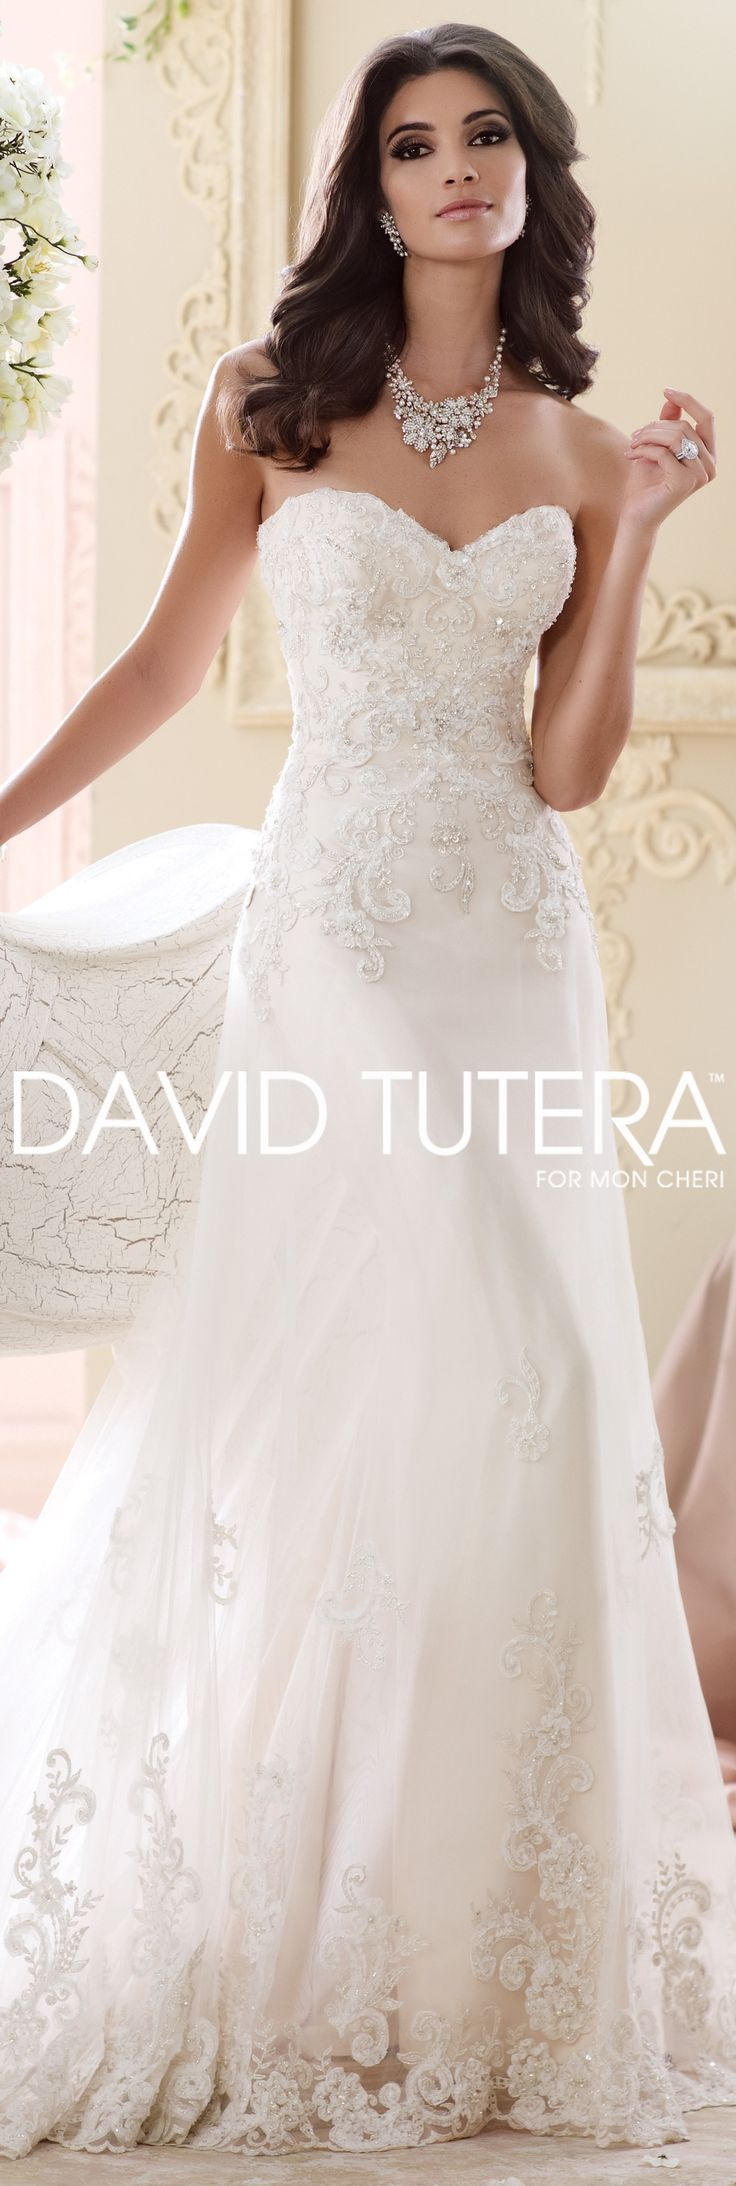 The David Tutera for Mon Cheri Fall 2015 Wedding Gown Collection - Style No. 215267 Nala #laceweddingdresses